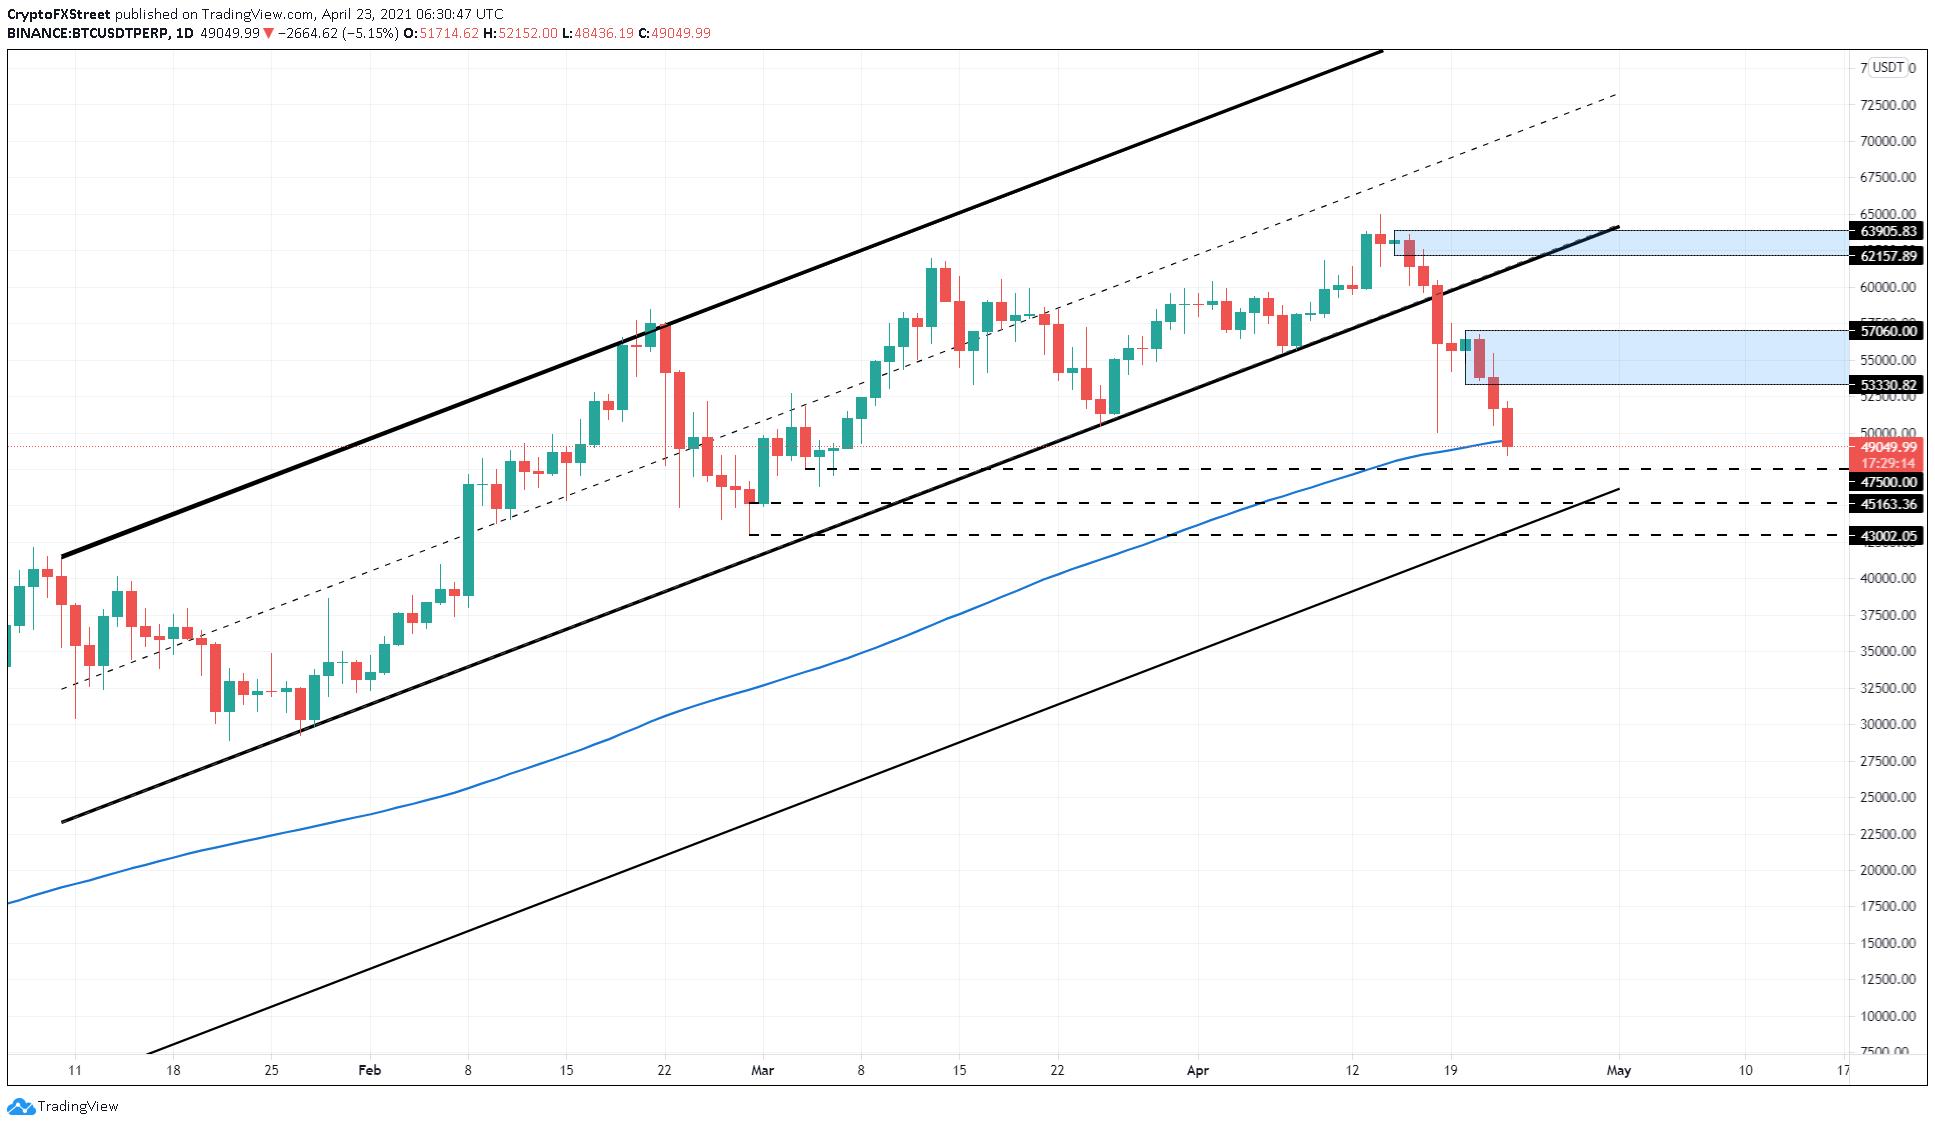 BTC/USDT 1-day chart